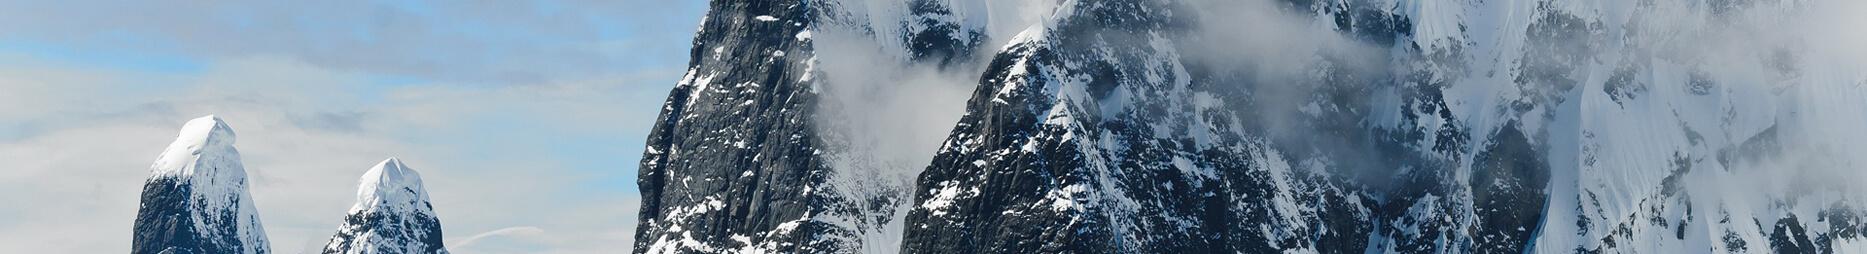 mountains-482689newslider-1